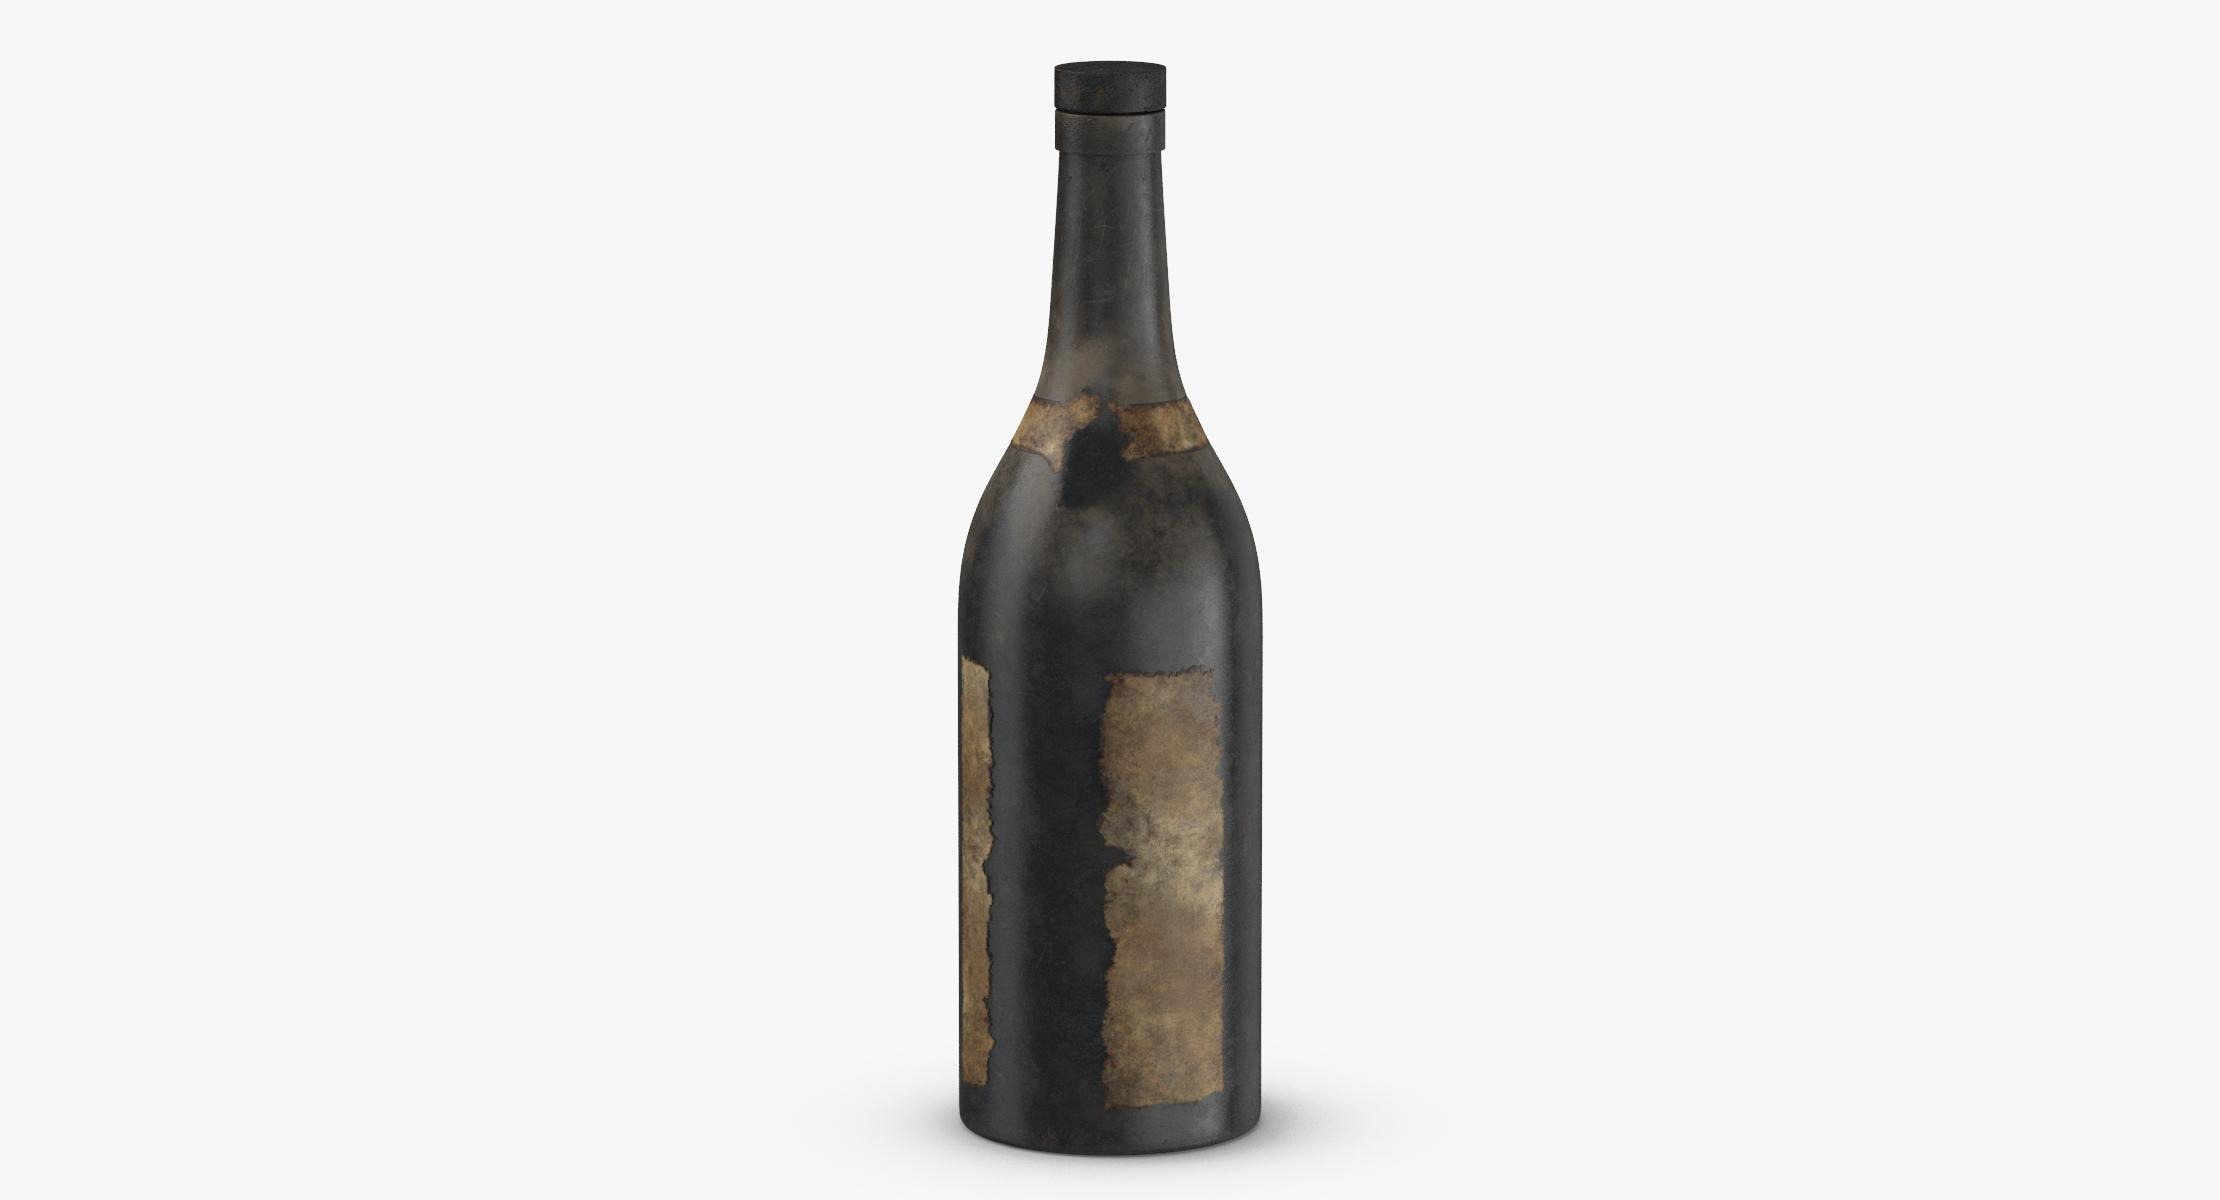 Old Bottle of Alcohol 03 - reel 1